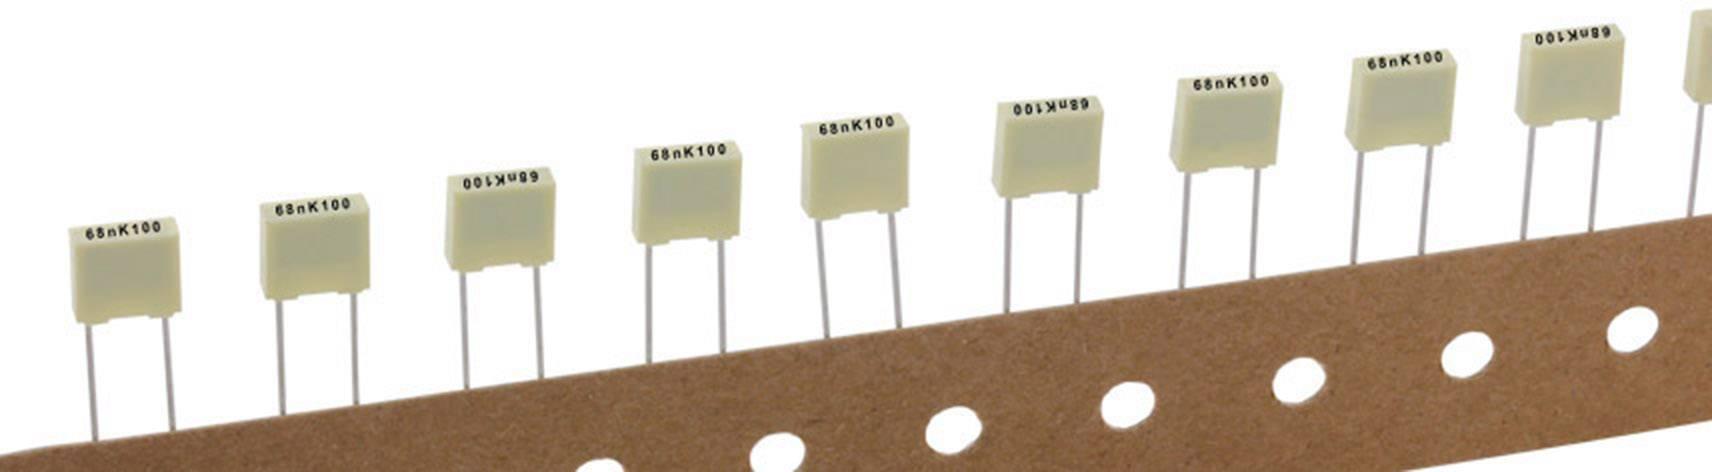 Polyesterový kondenzátor Kemet R82DC4100DQ60K+ radiální, 1 µF, 63 V,10 %, 5 mm, (d x š x v) 7.2 x 5 x 10 , 1 ks